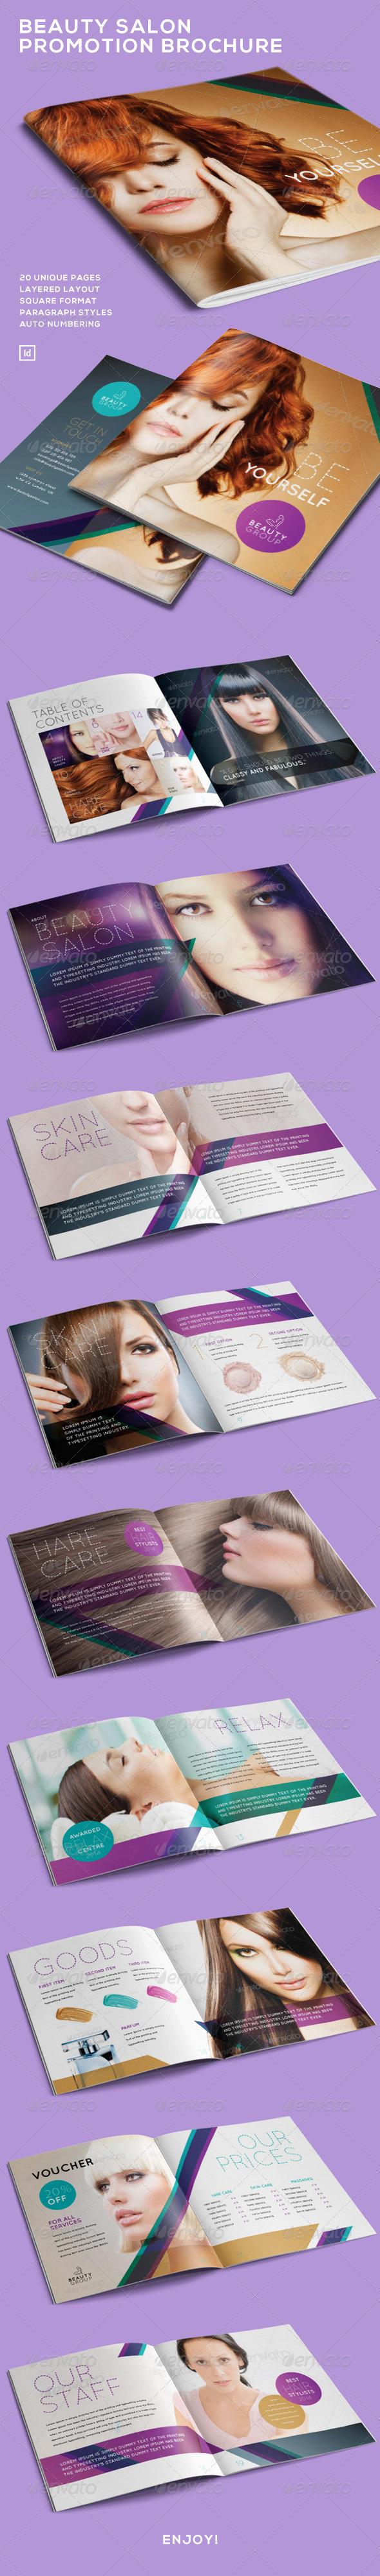 Beauty Salon Promotion Brochure - Brochures Print Templates